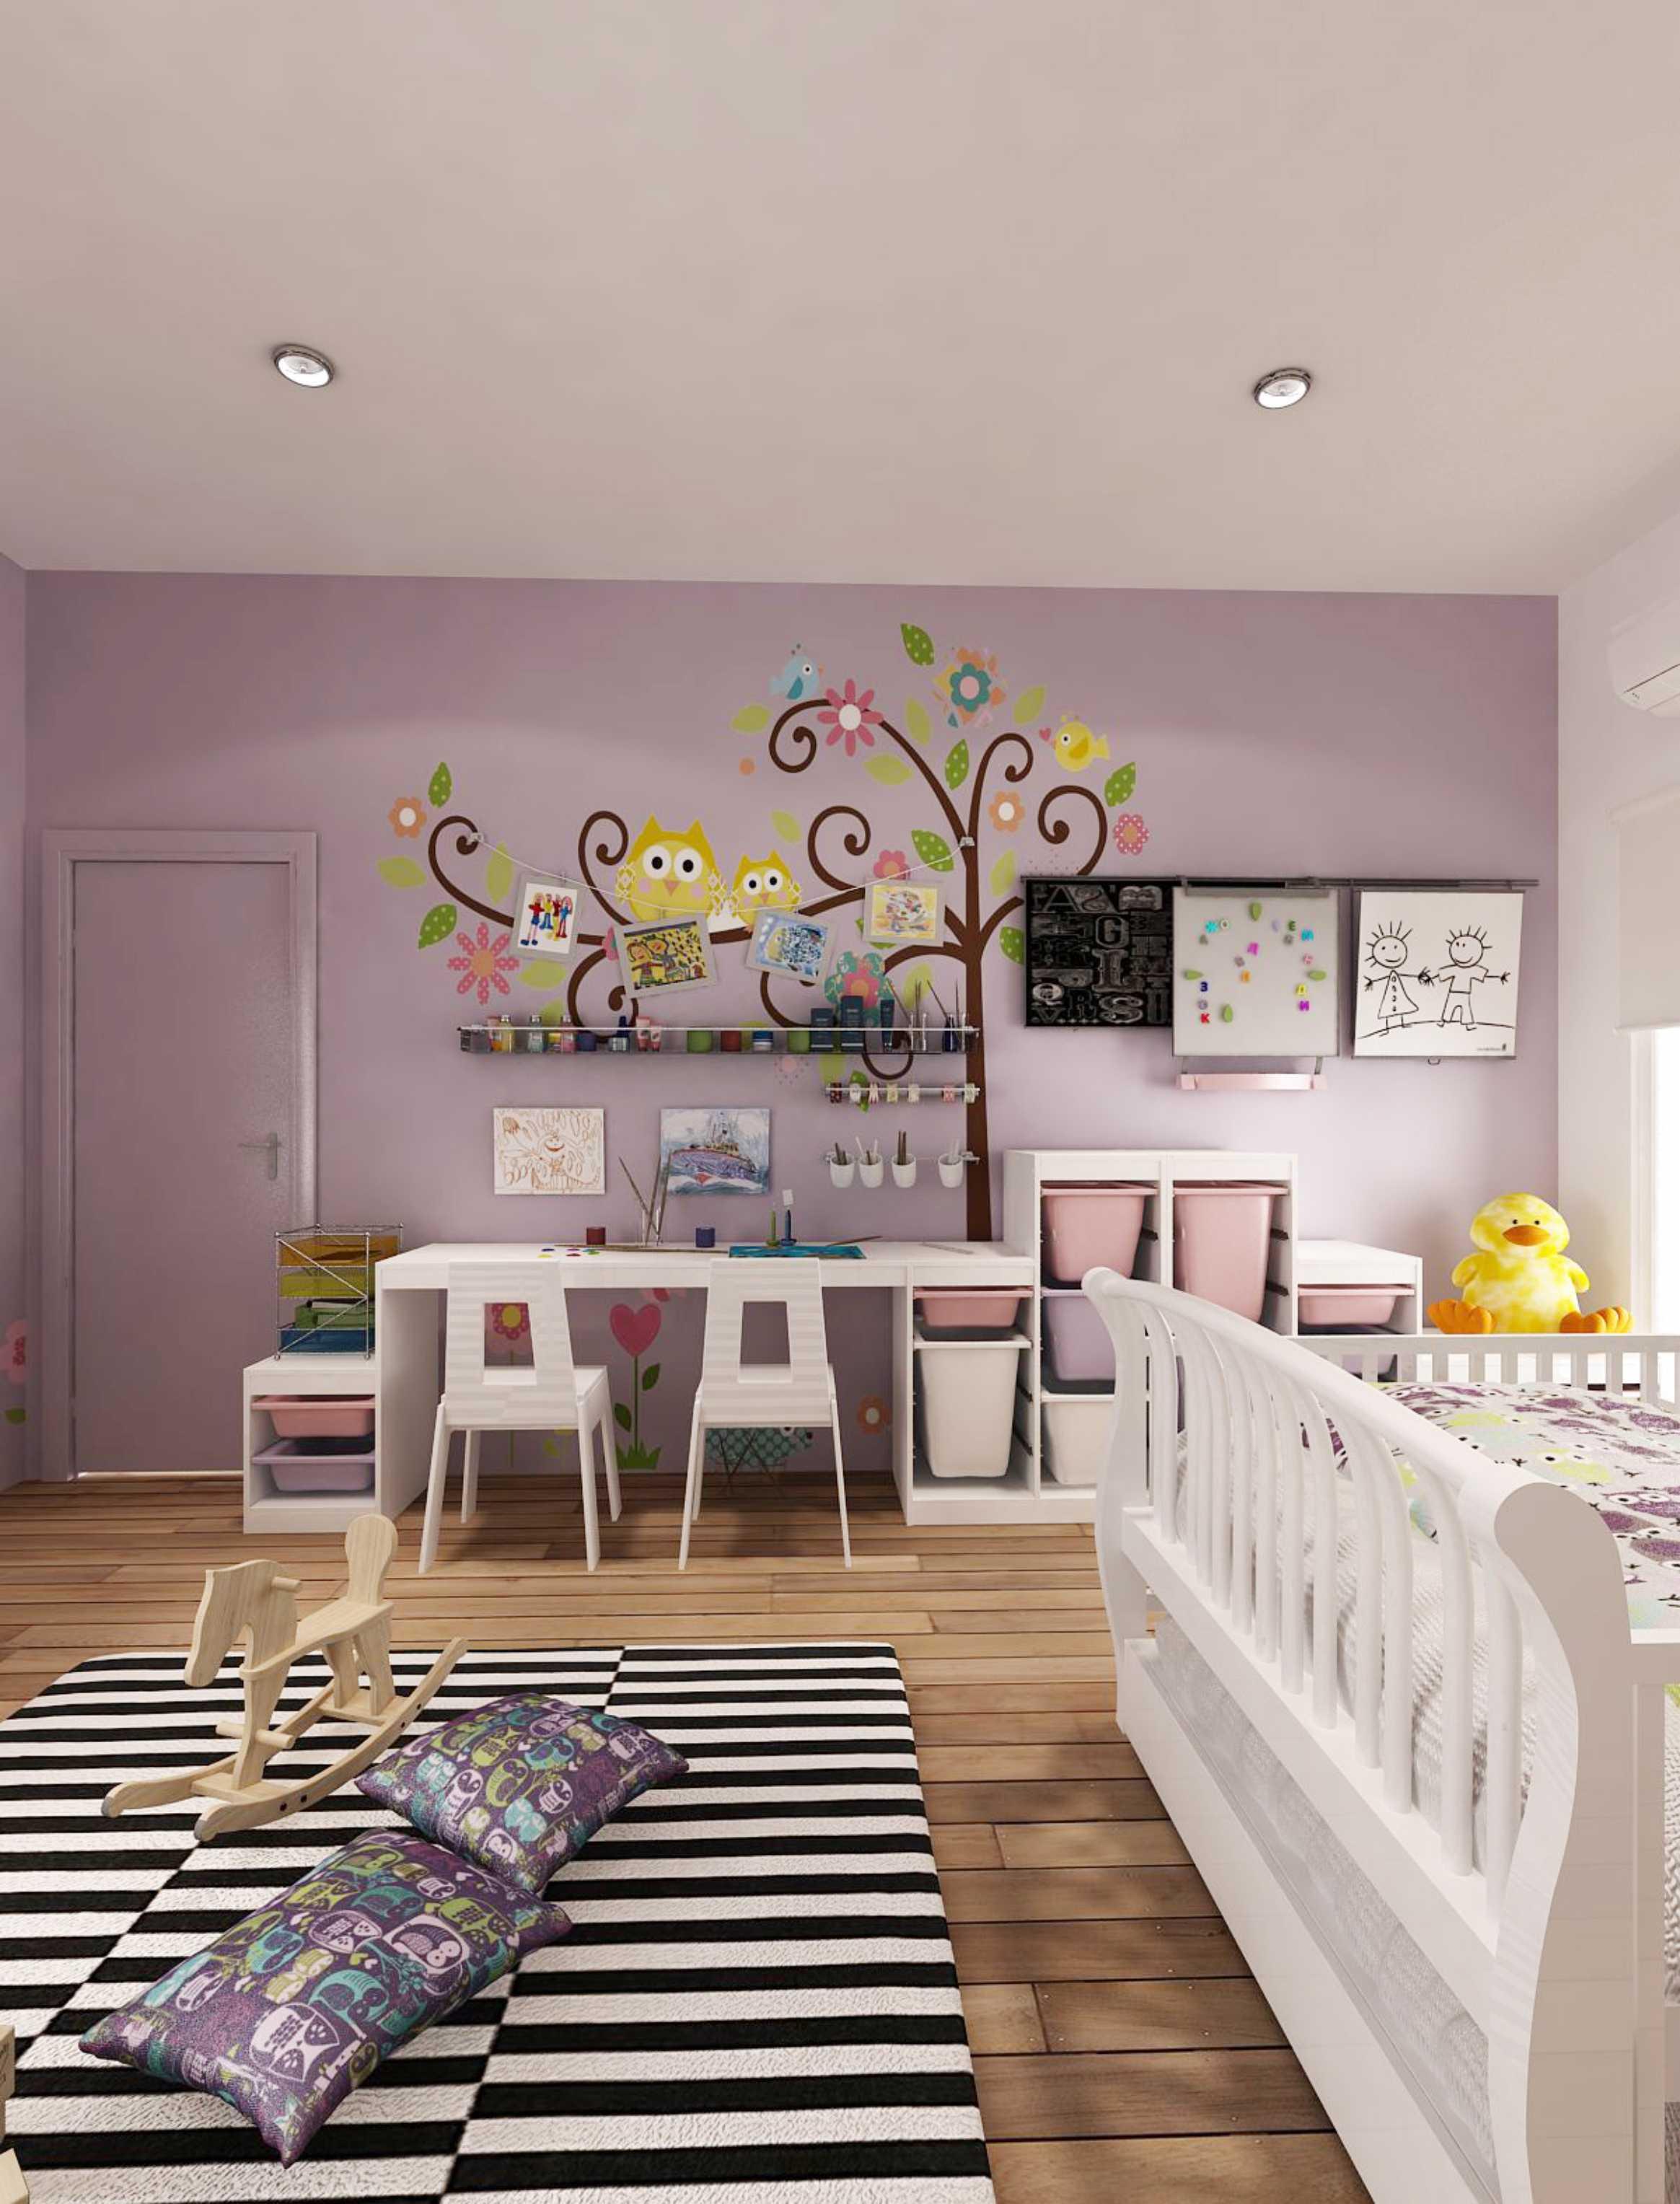 Revano Satria Paulus Hyu  Jakarta, Indonesia Jakarta, Indonesia Kids-Bedroom   16237